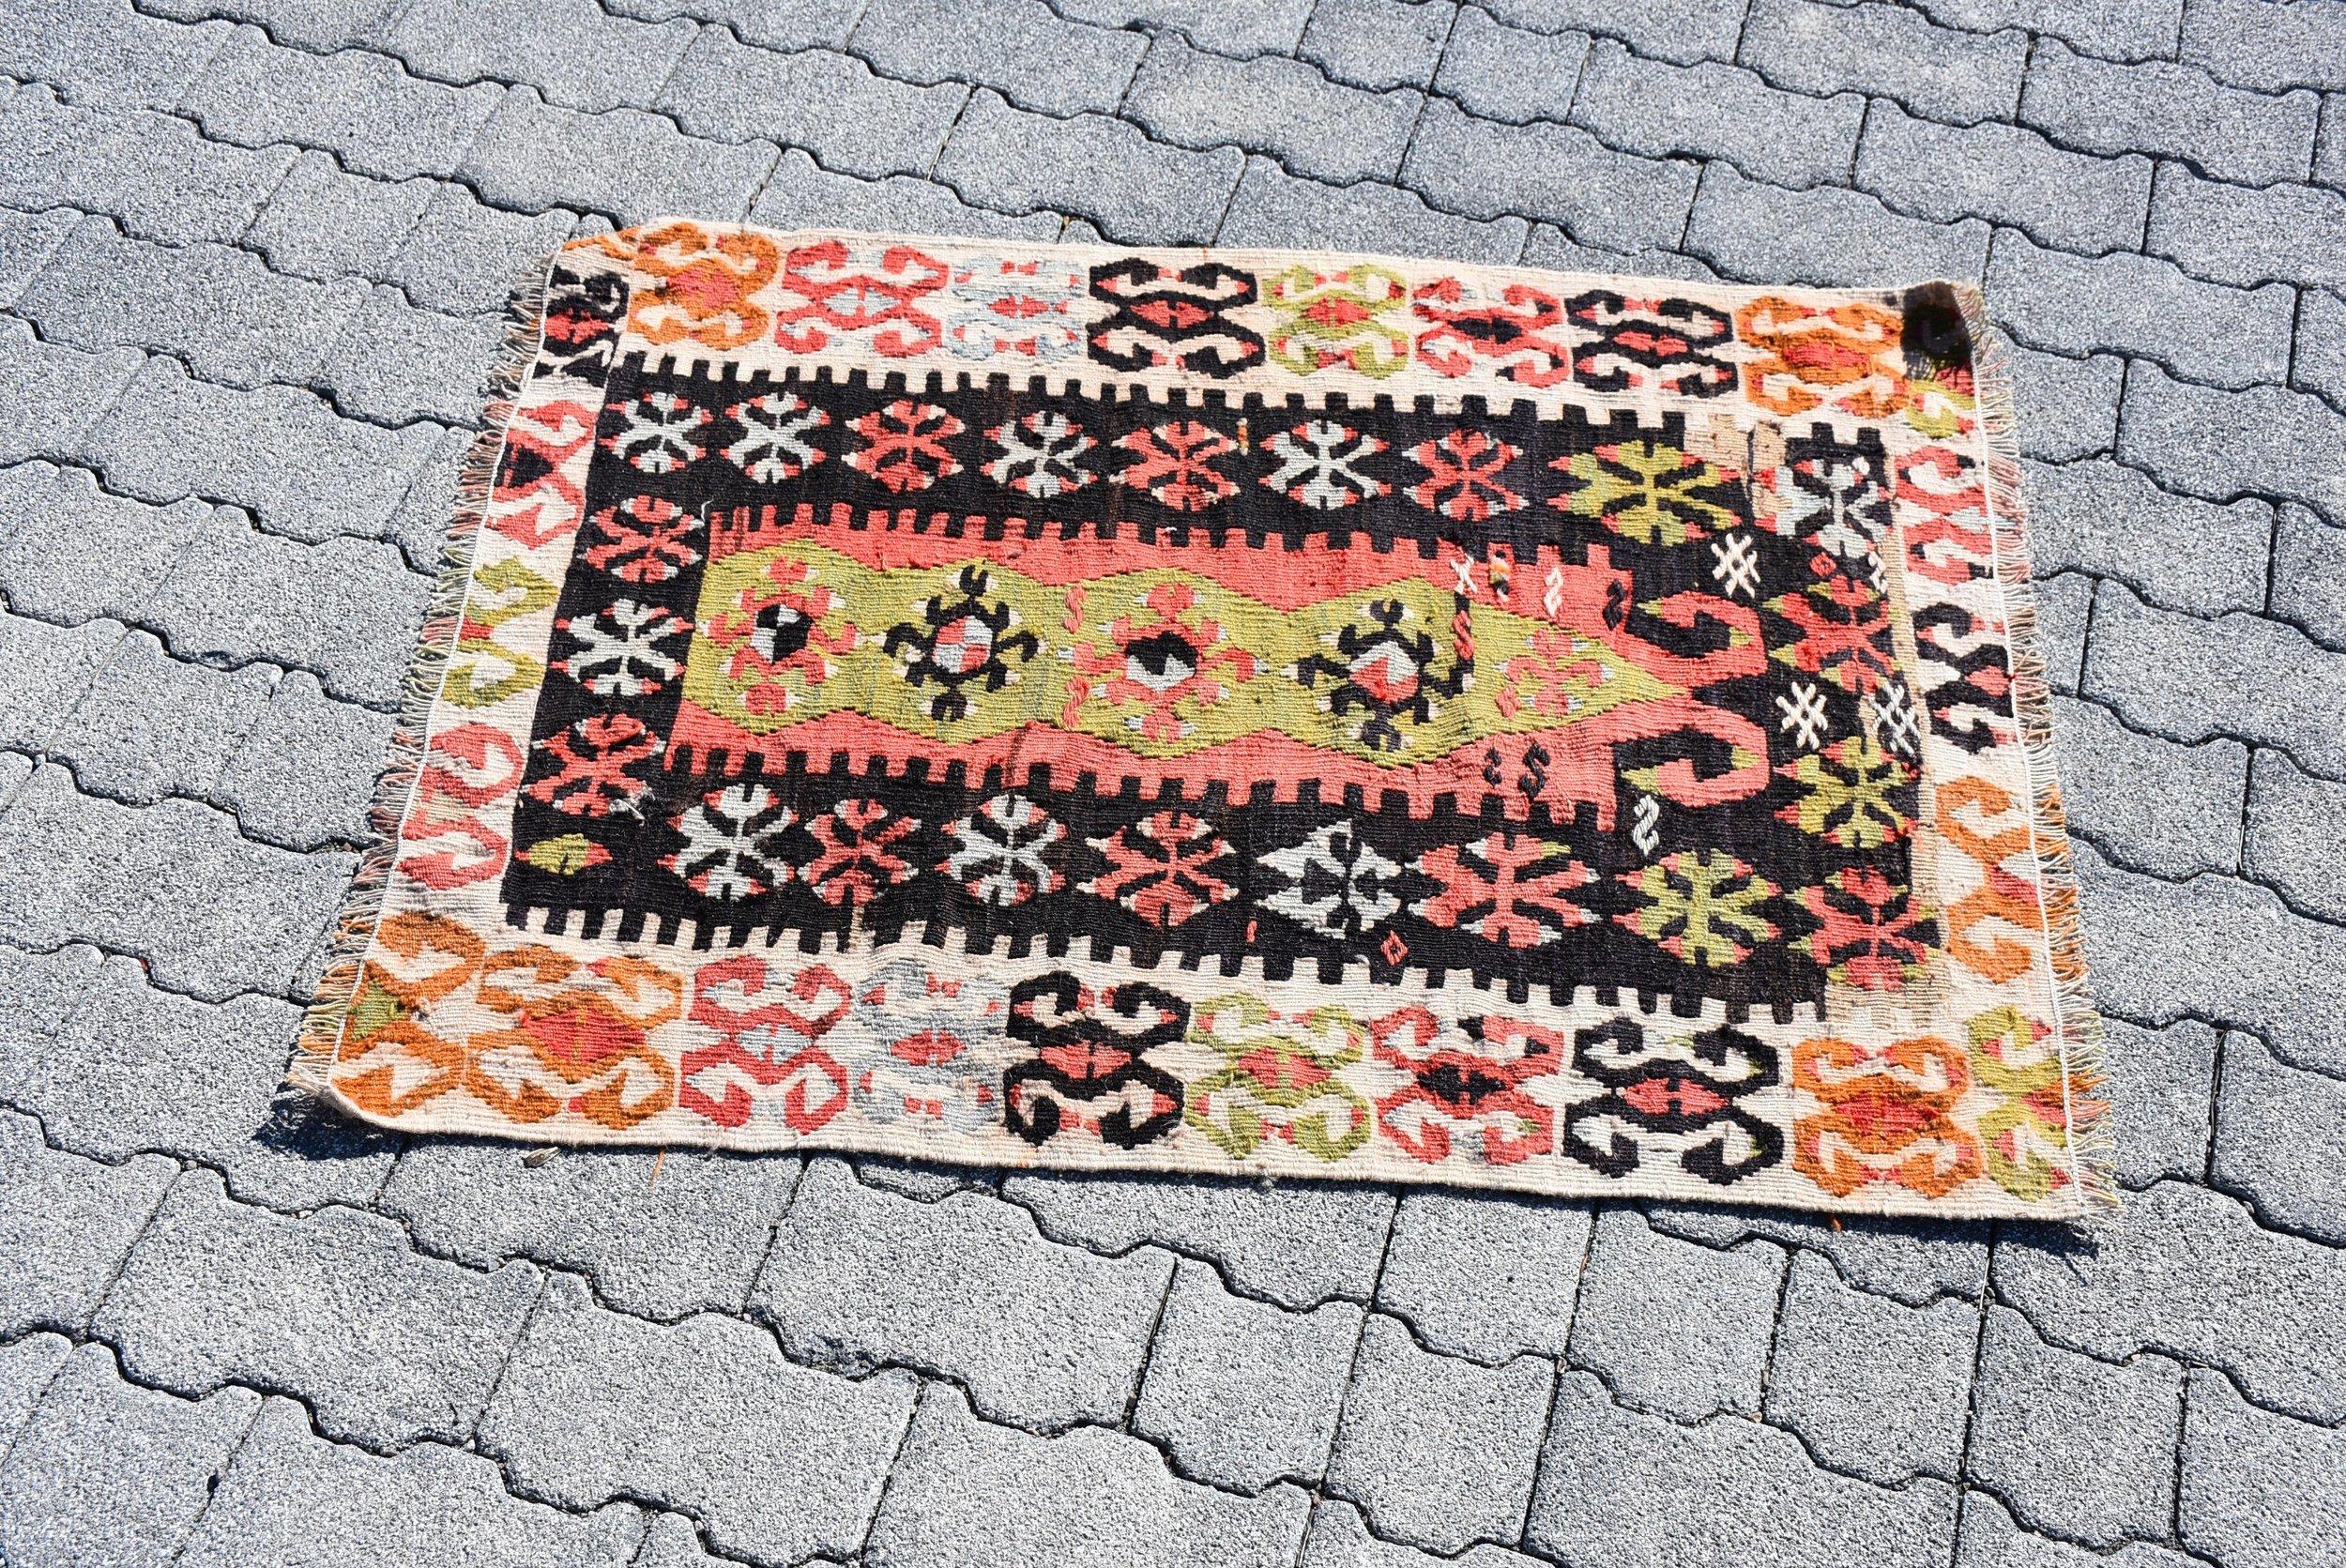 Vintage Small Size Kilim Rug by decolifeturkishrug - Etsy